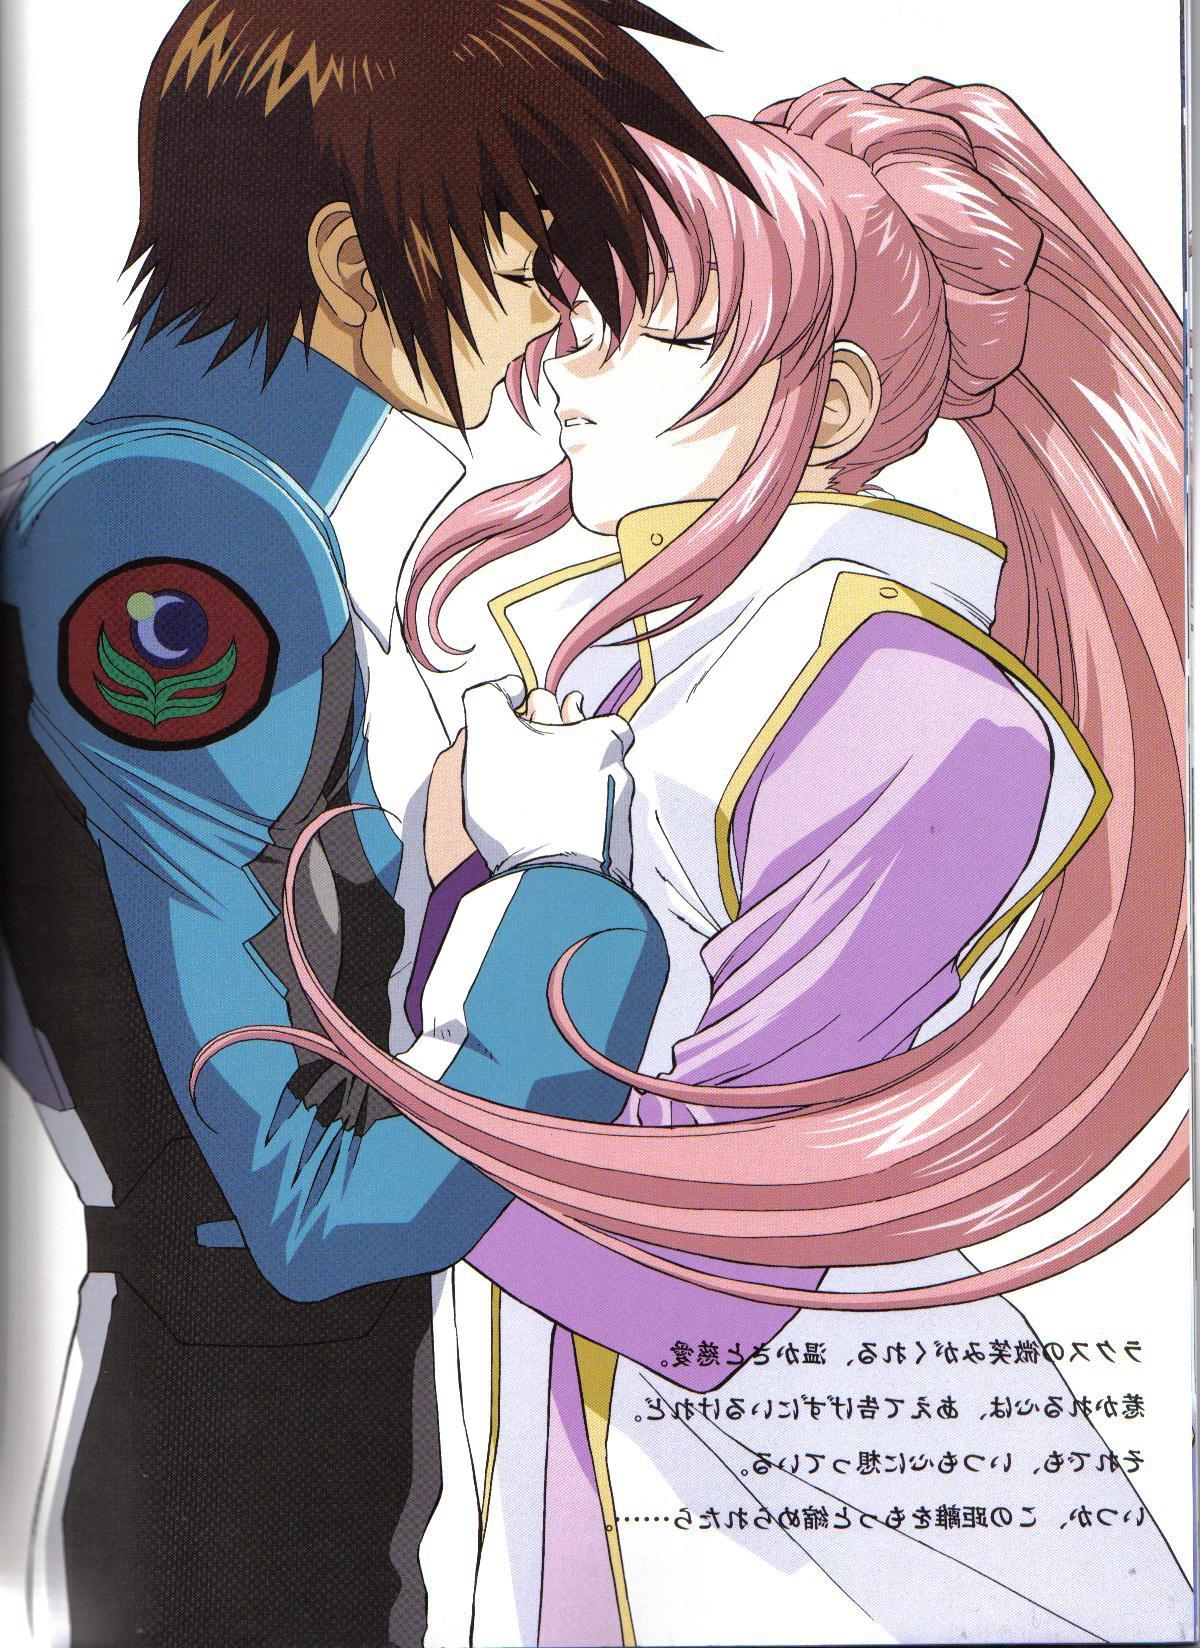 kira yamato and lacus clyne relationship